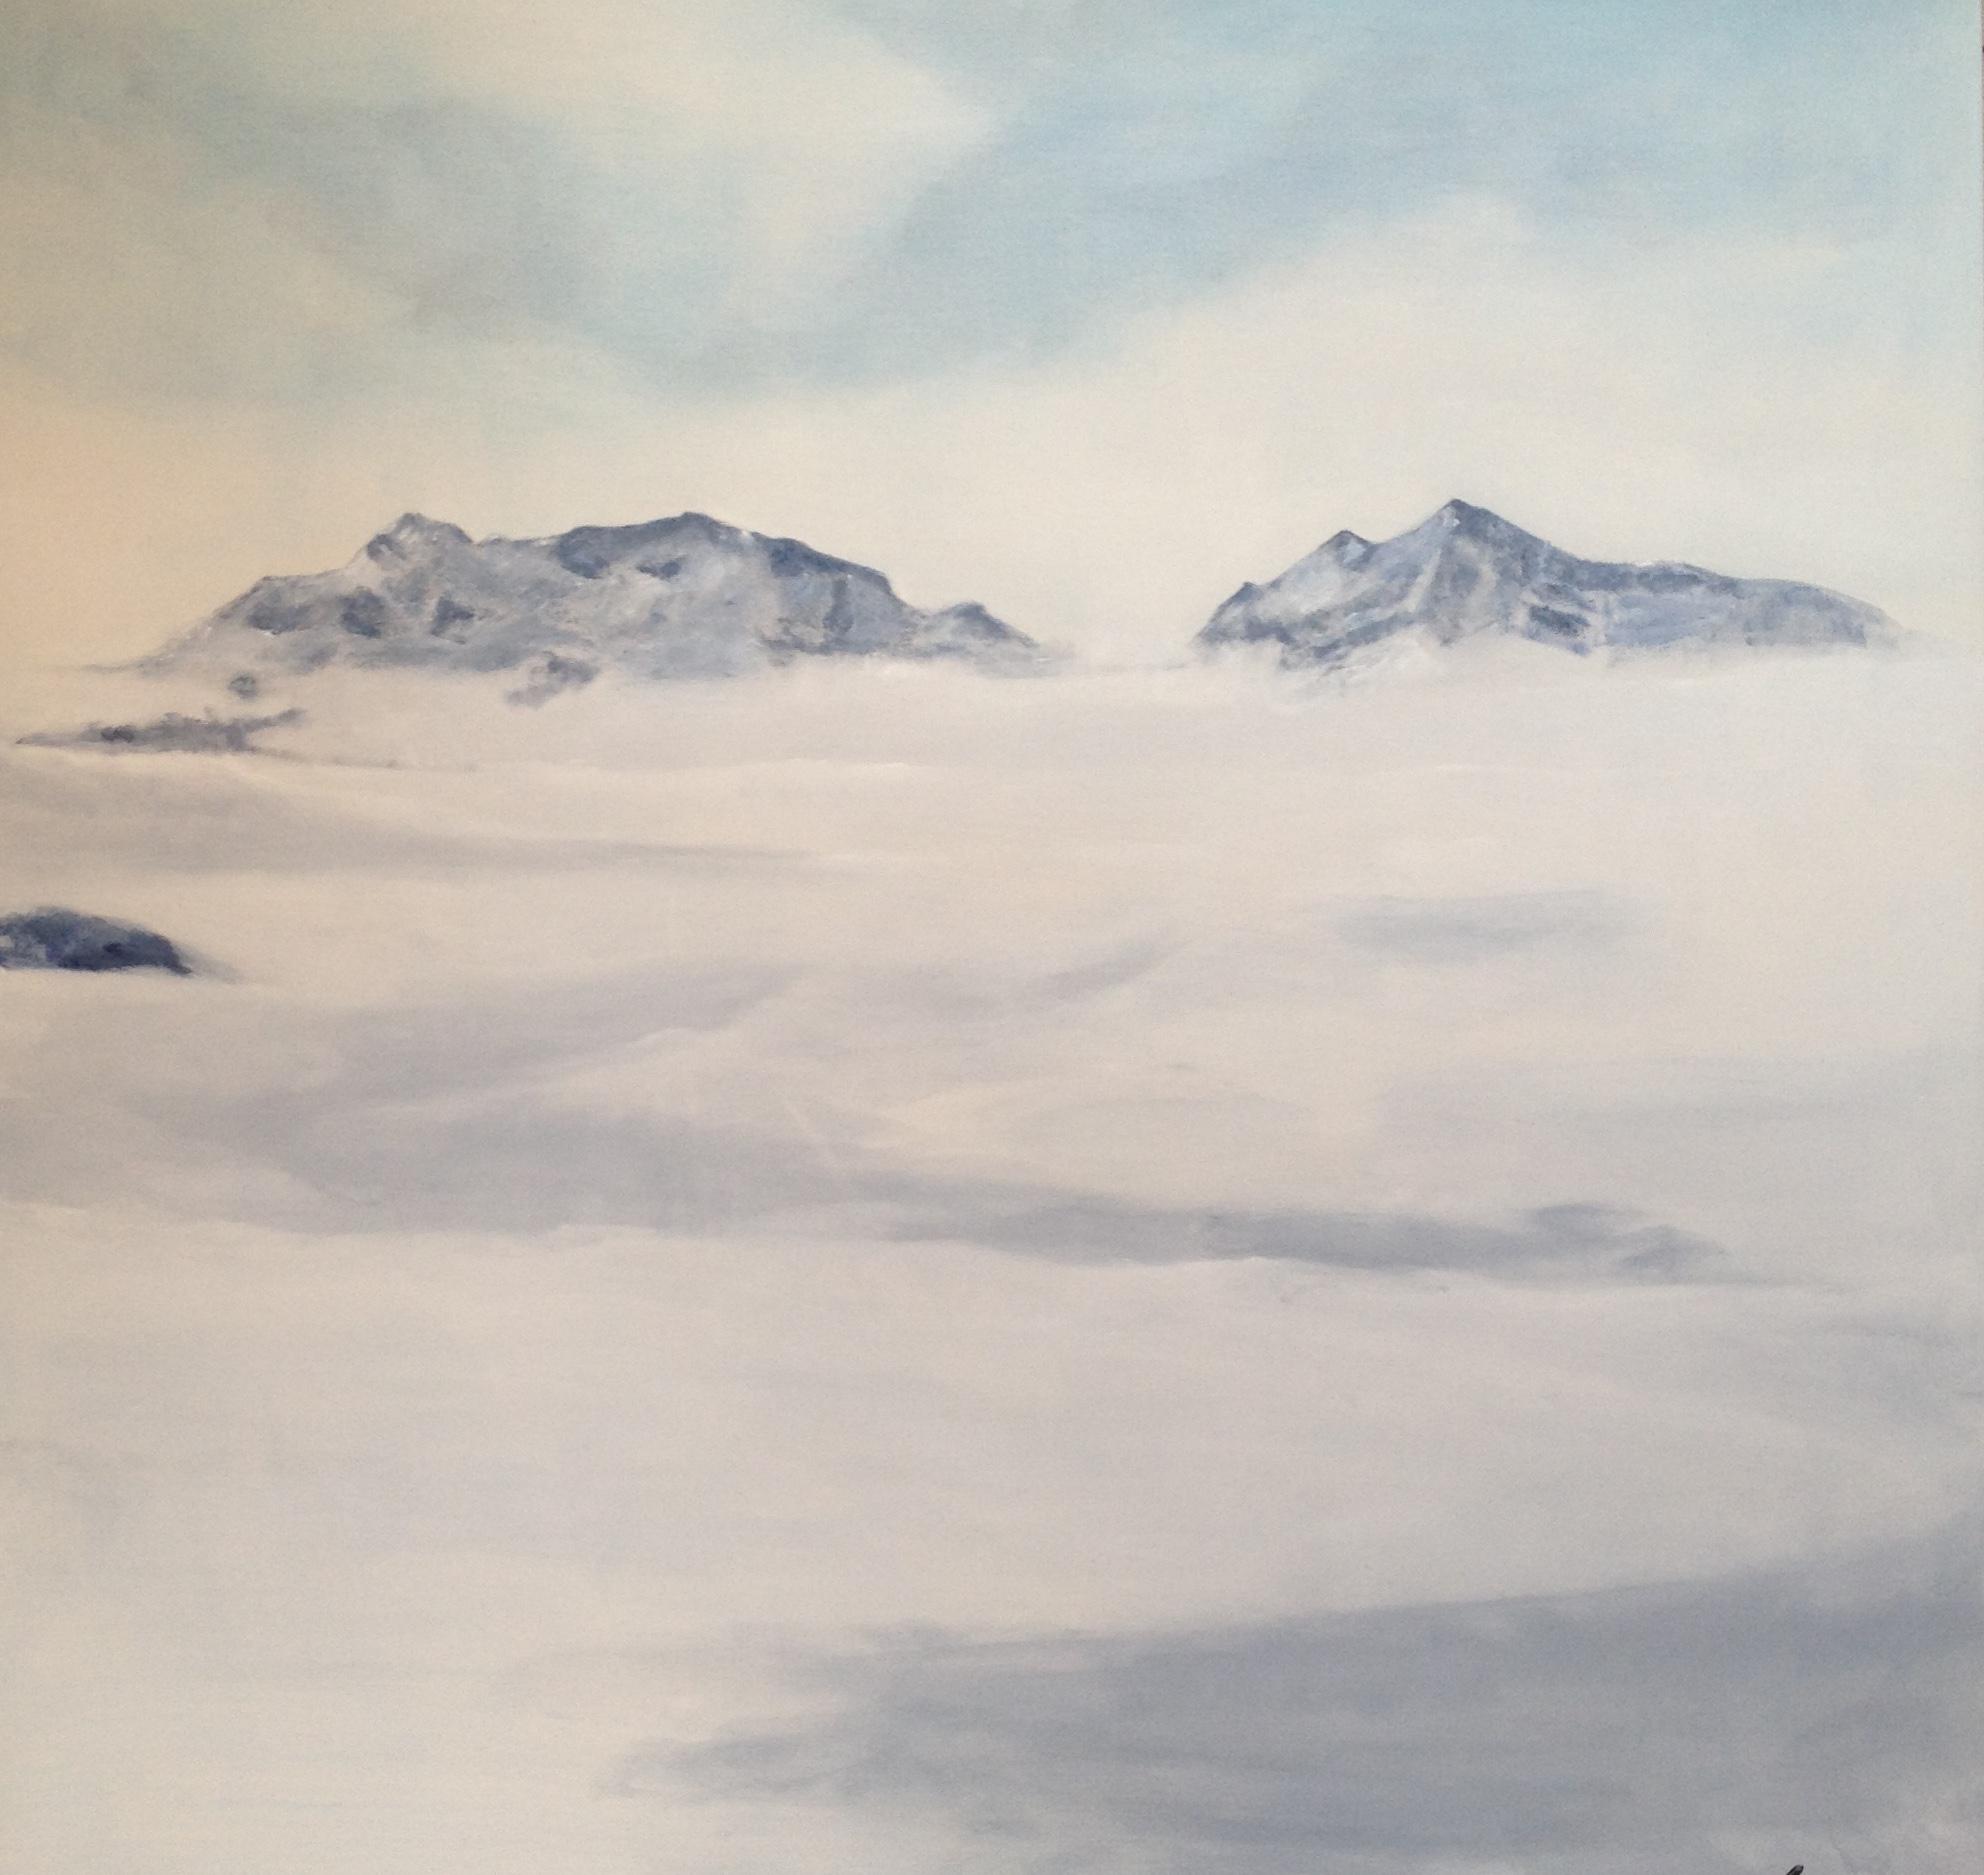 Nebelmeer, 110cm x 110cm Acryl auf Leinwand, unverkäuflich